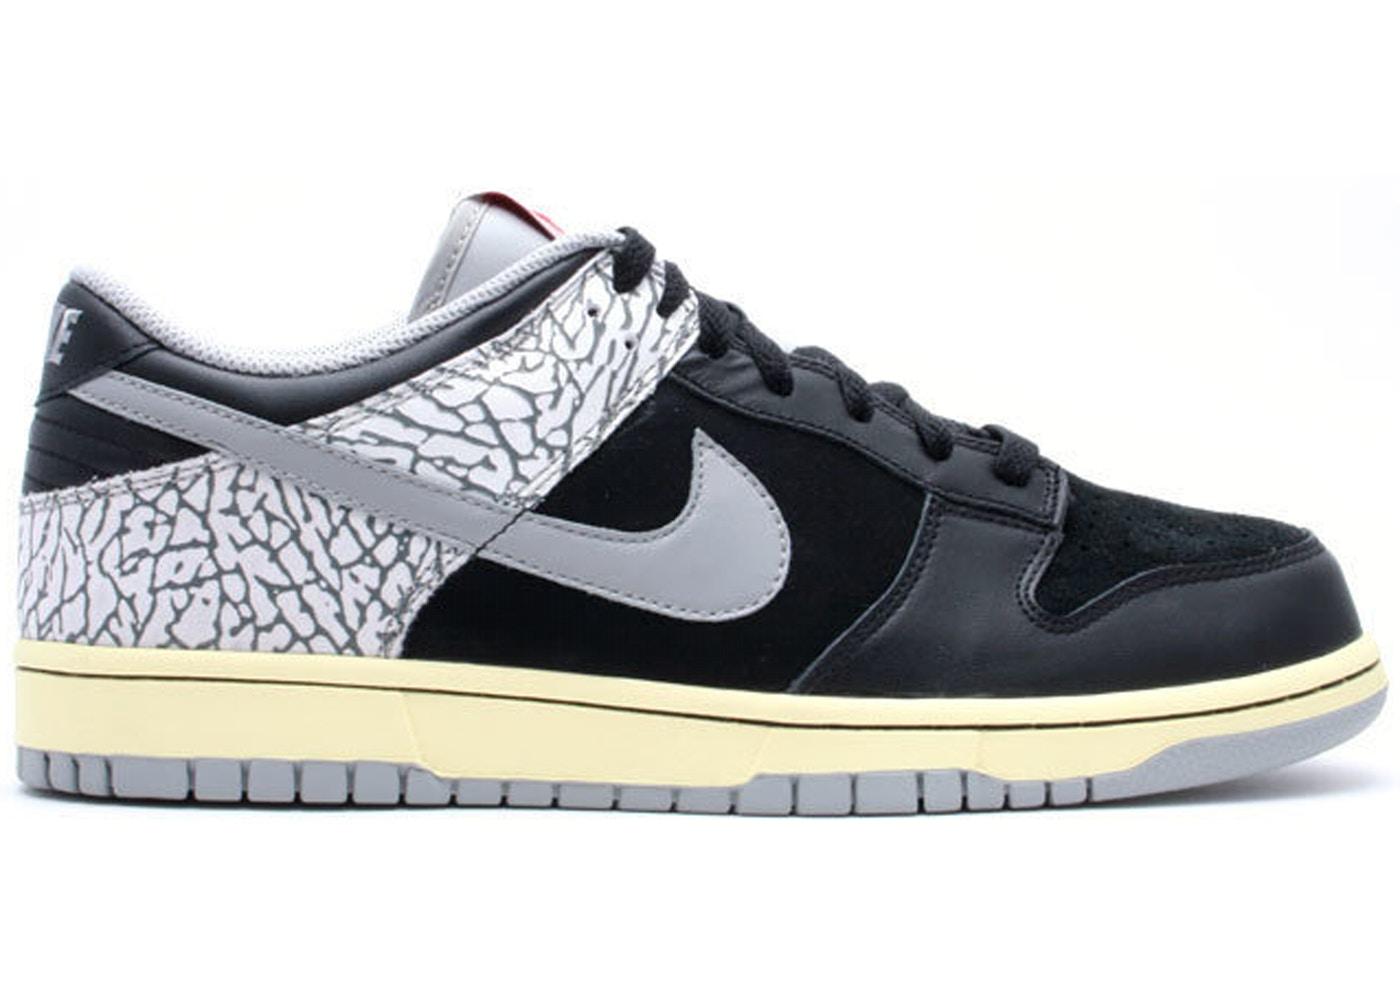 Nike Dunk Low J-Pack Black Cement (2009) - 304714-905 75e90819b